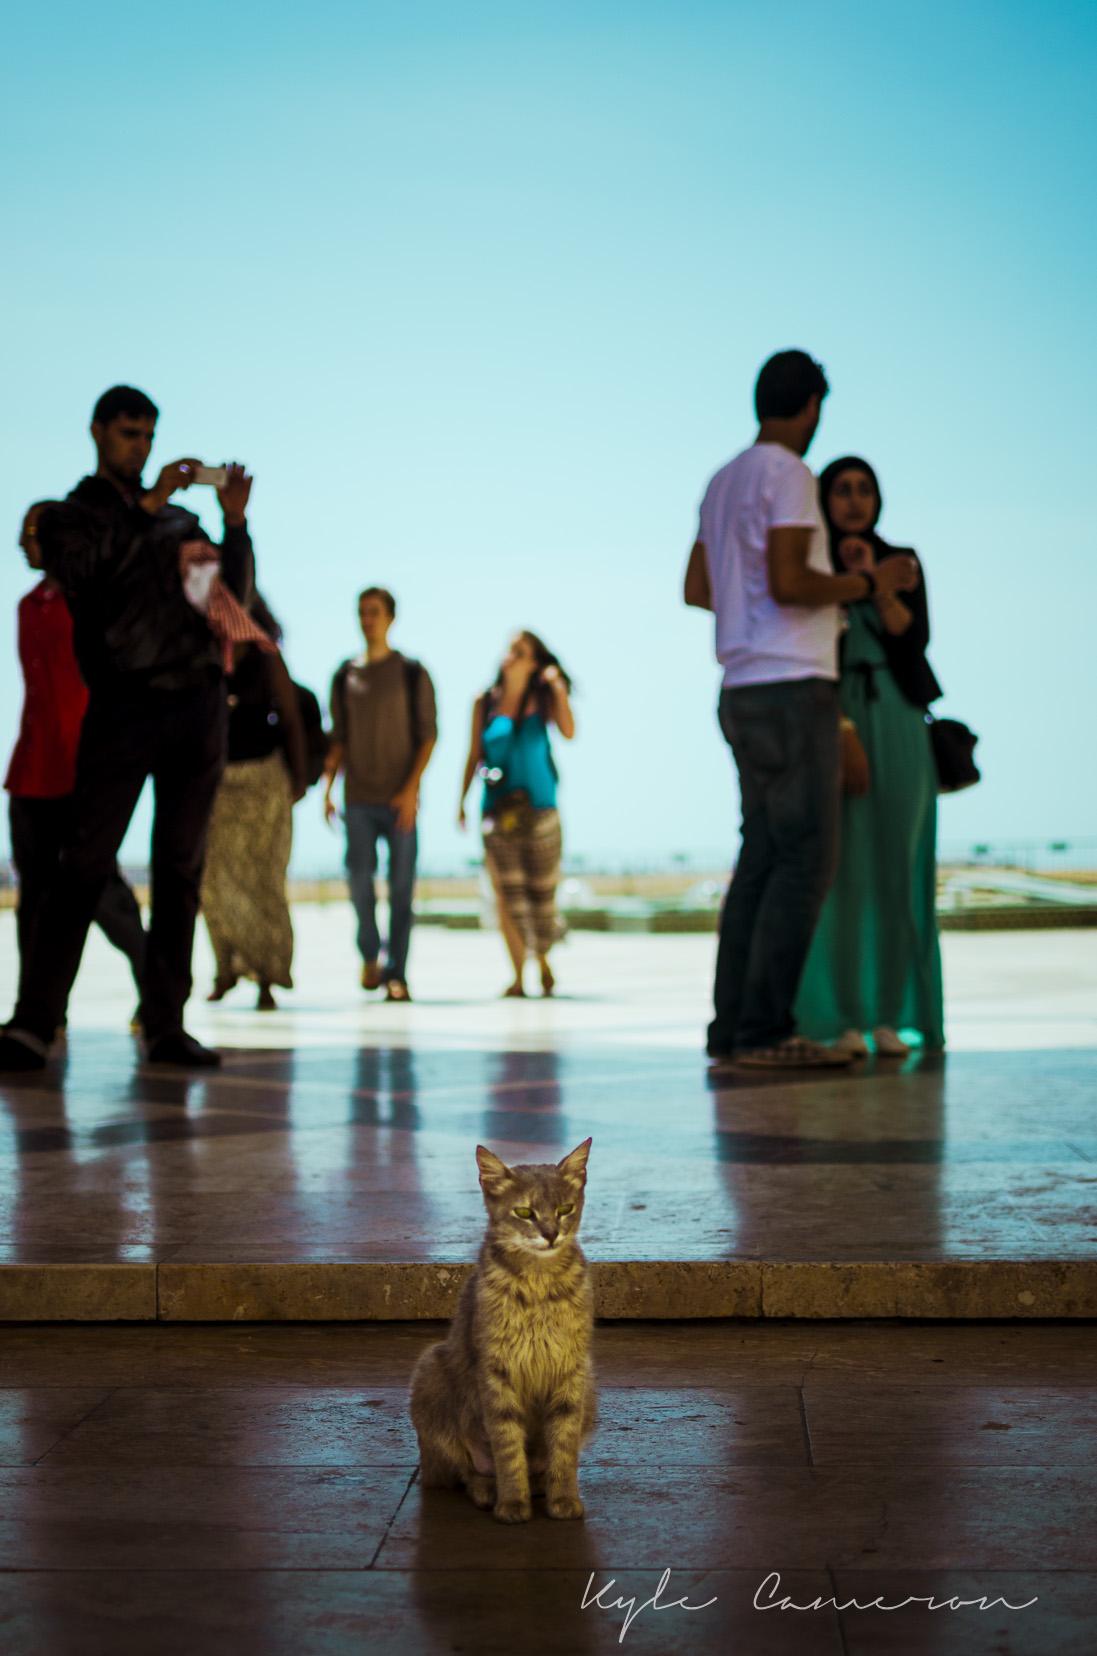 Cat vs. World